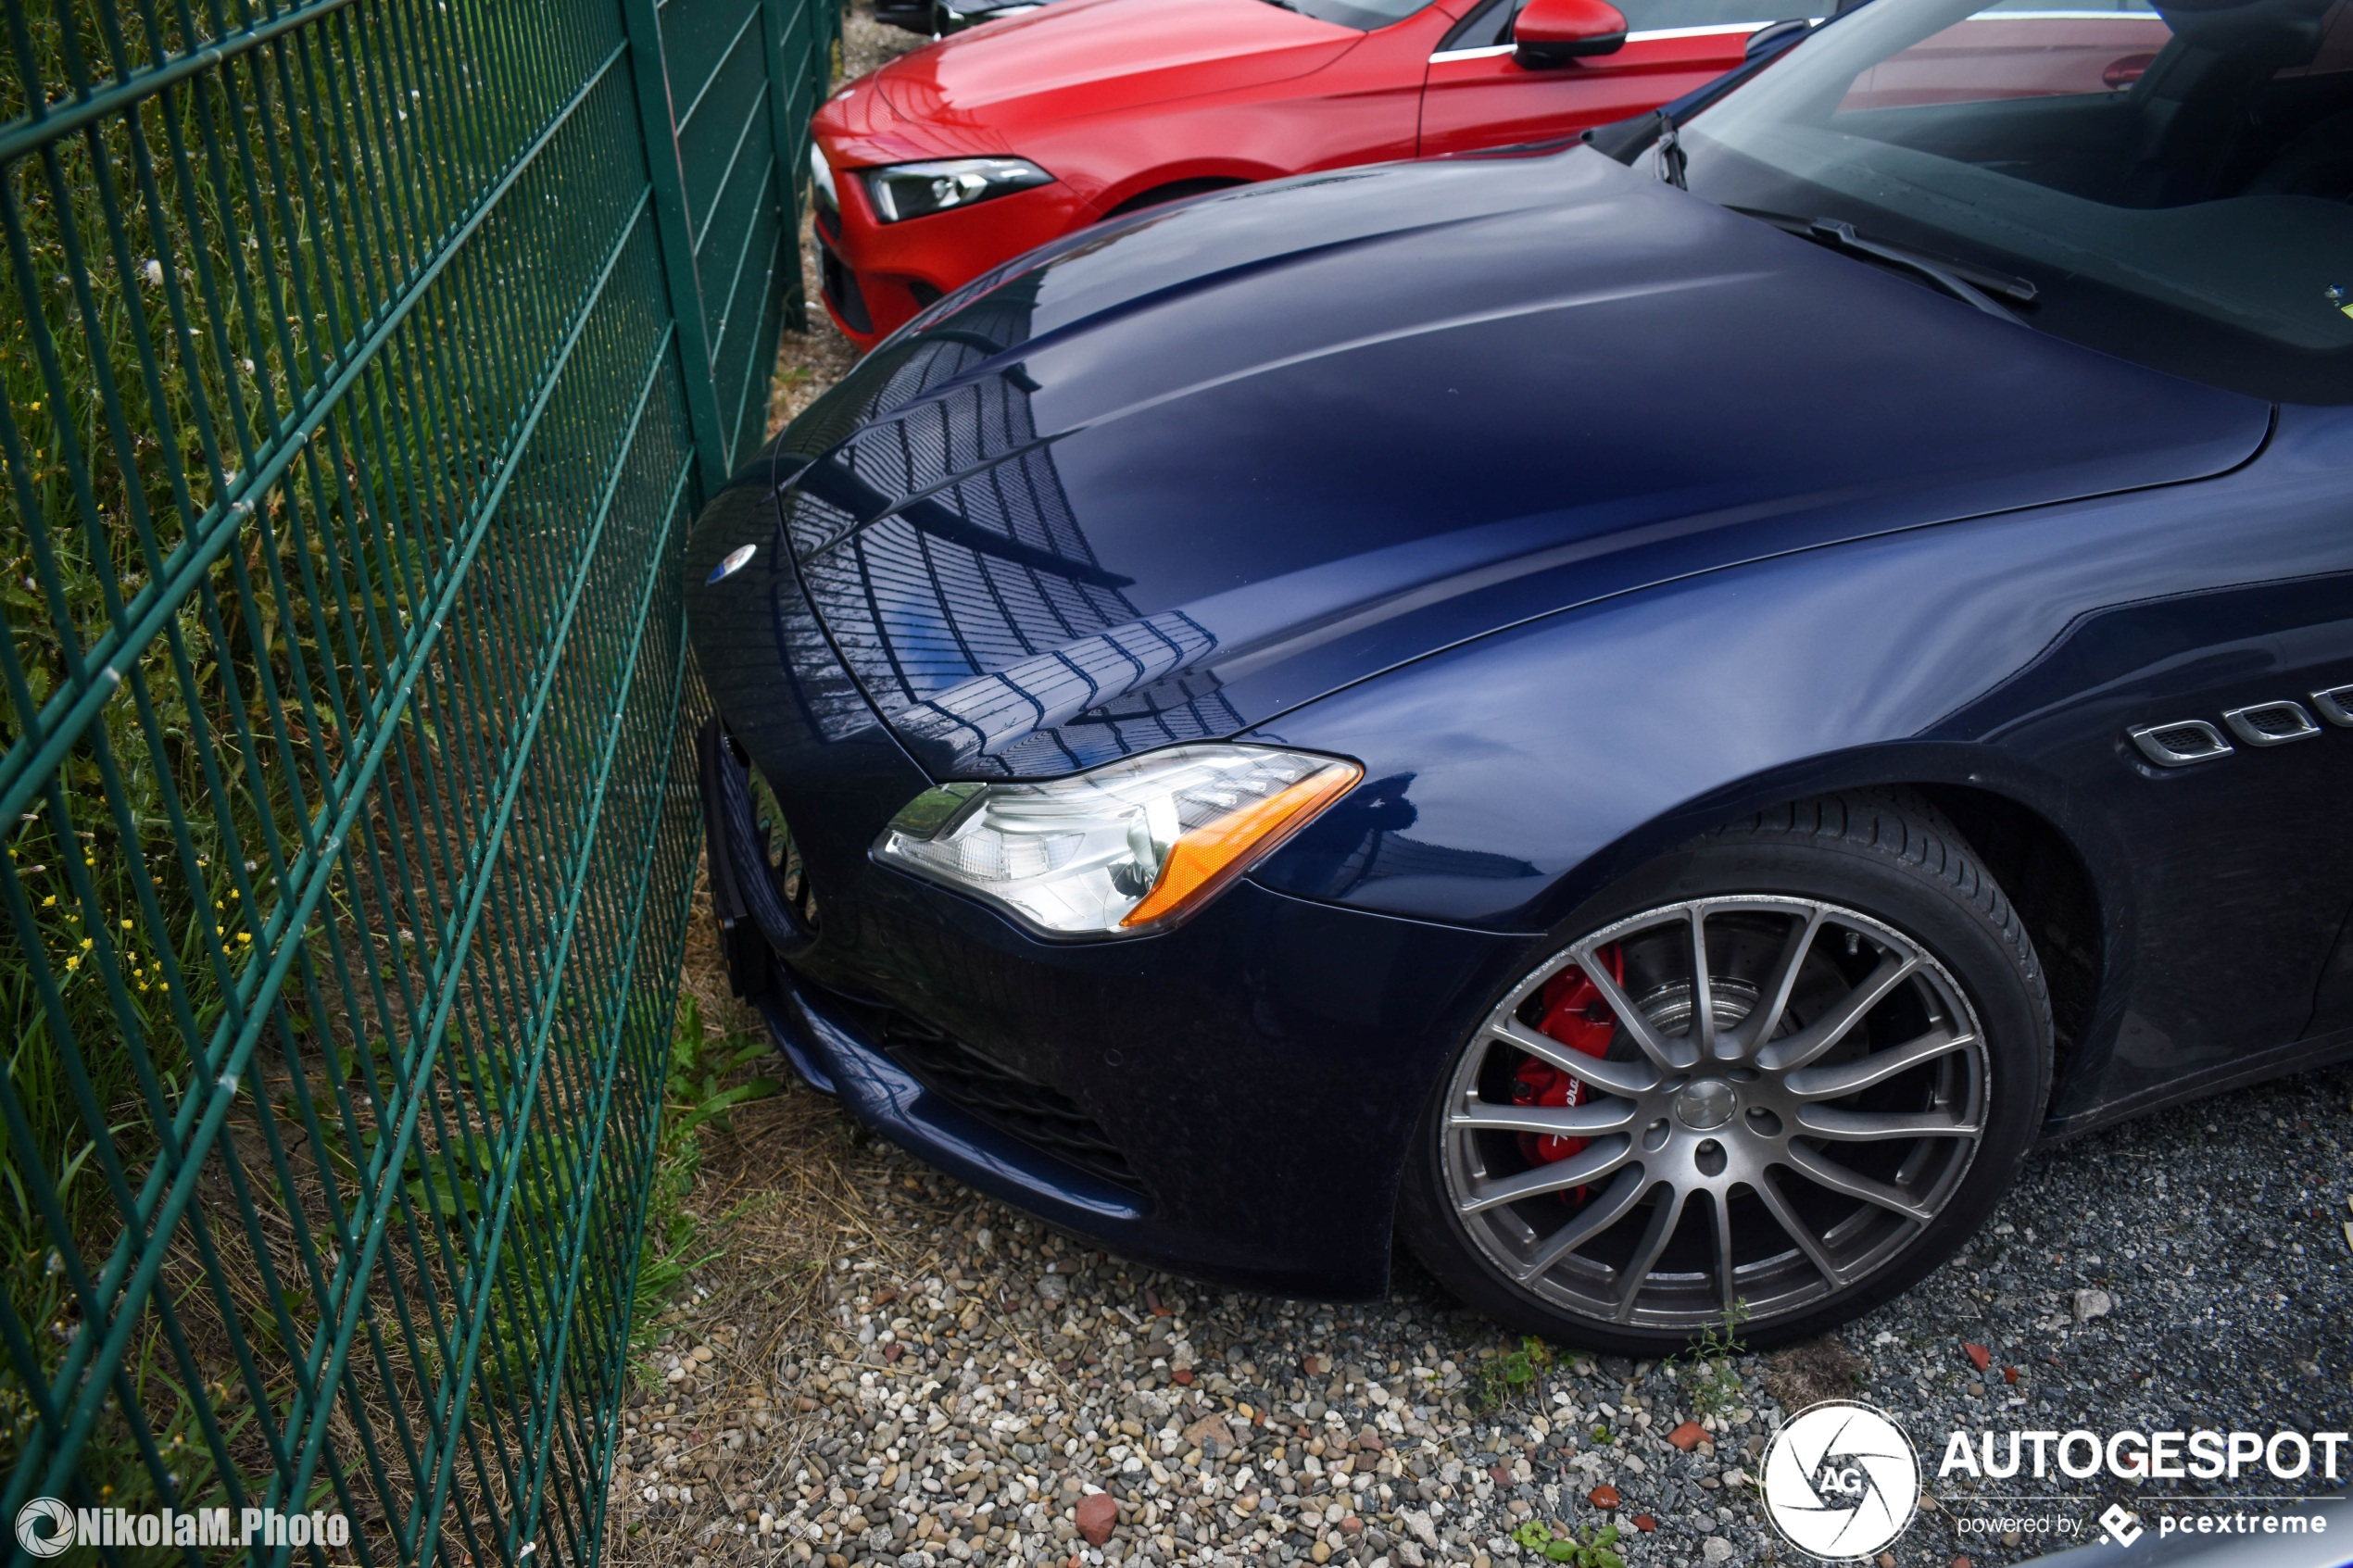 Maserati Quattroporte Diesel GranLusso - 24 maart 2020 - Autogespot